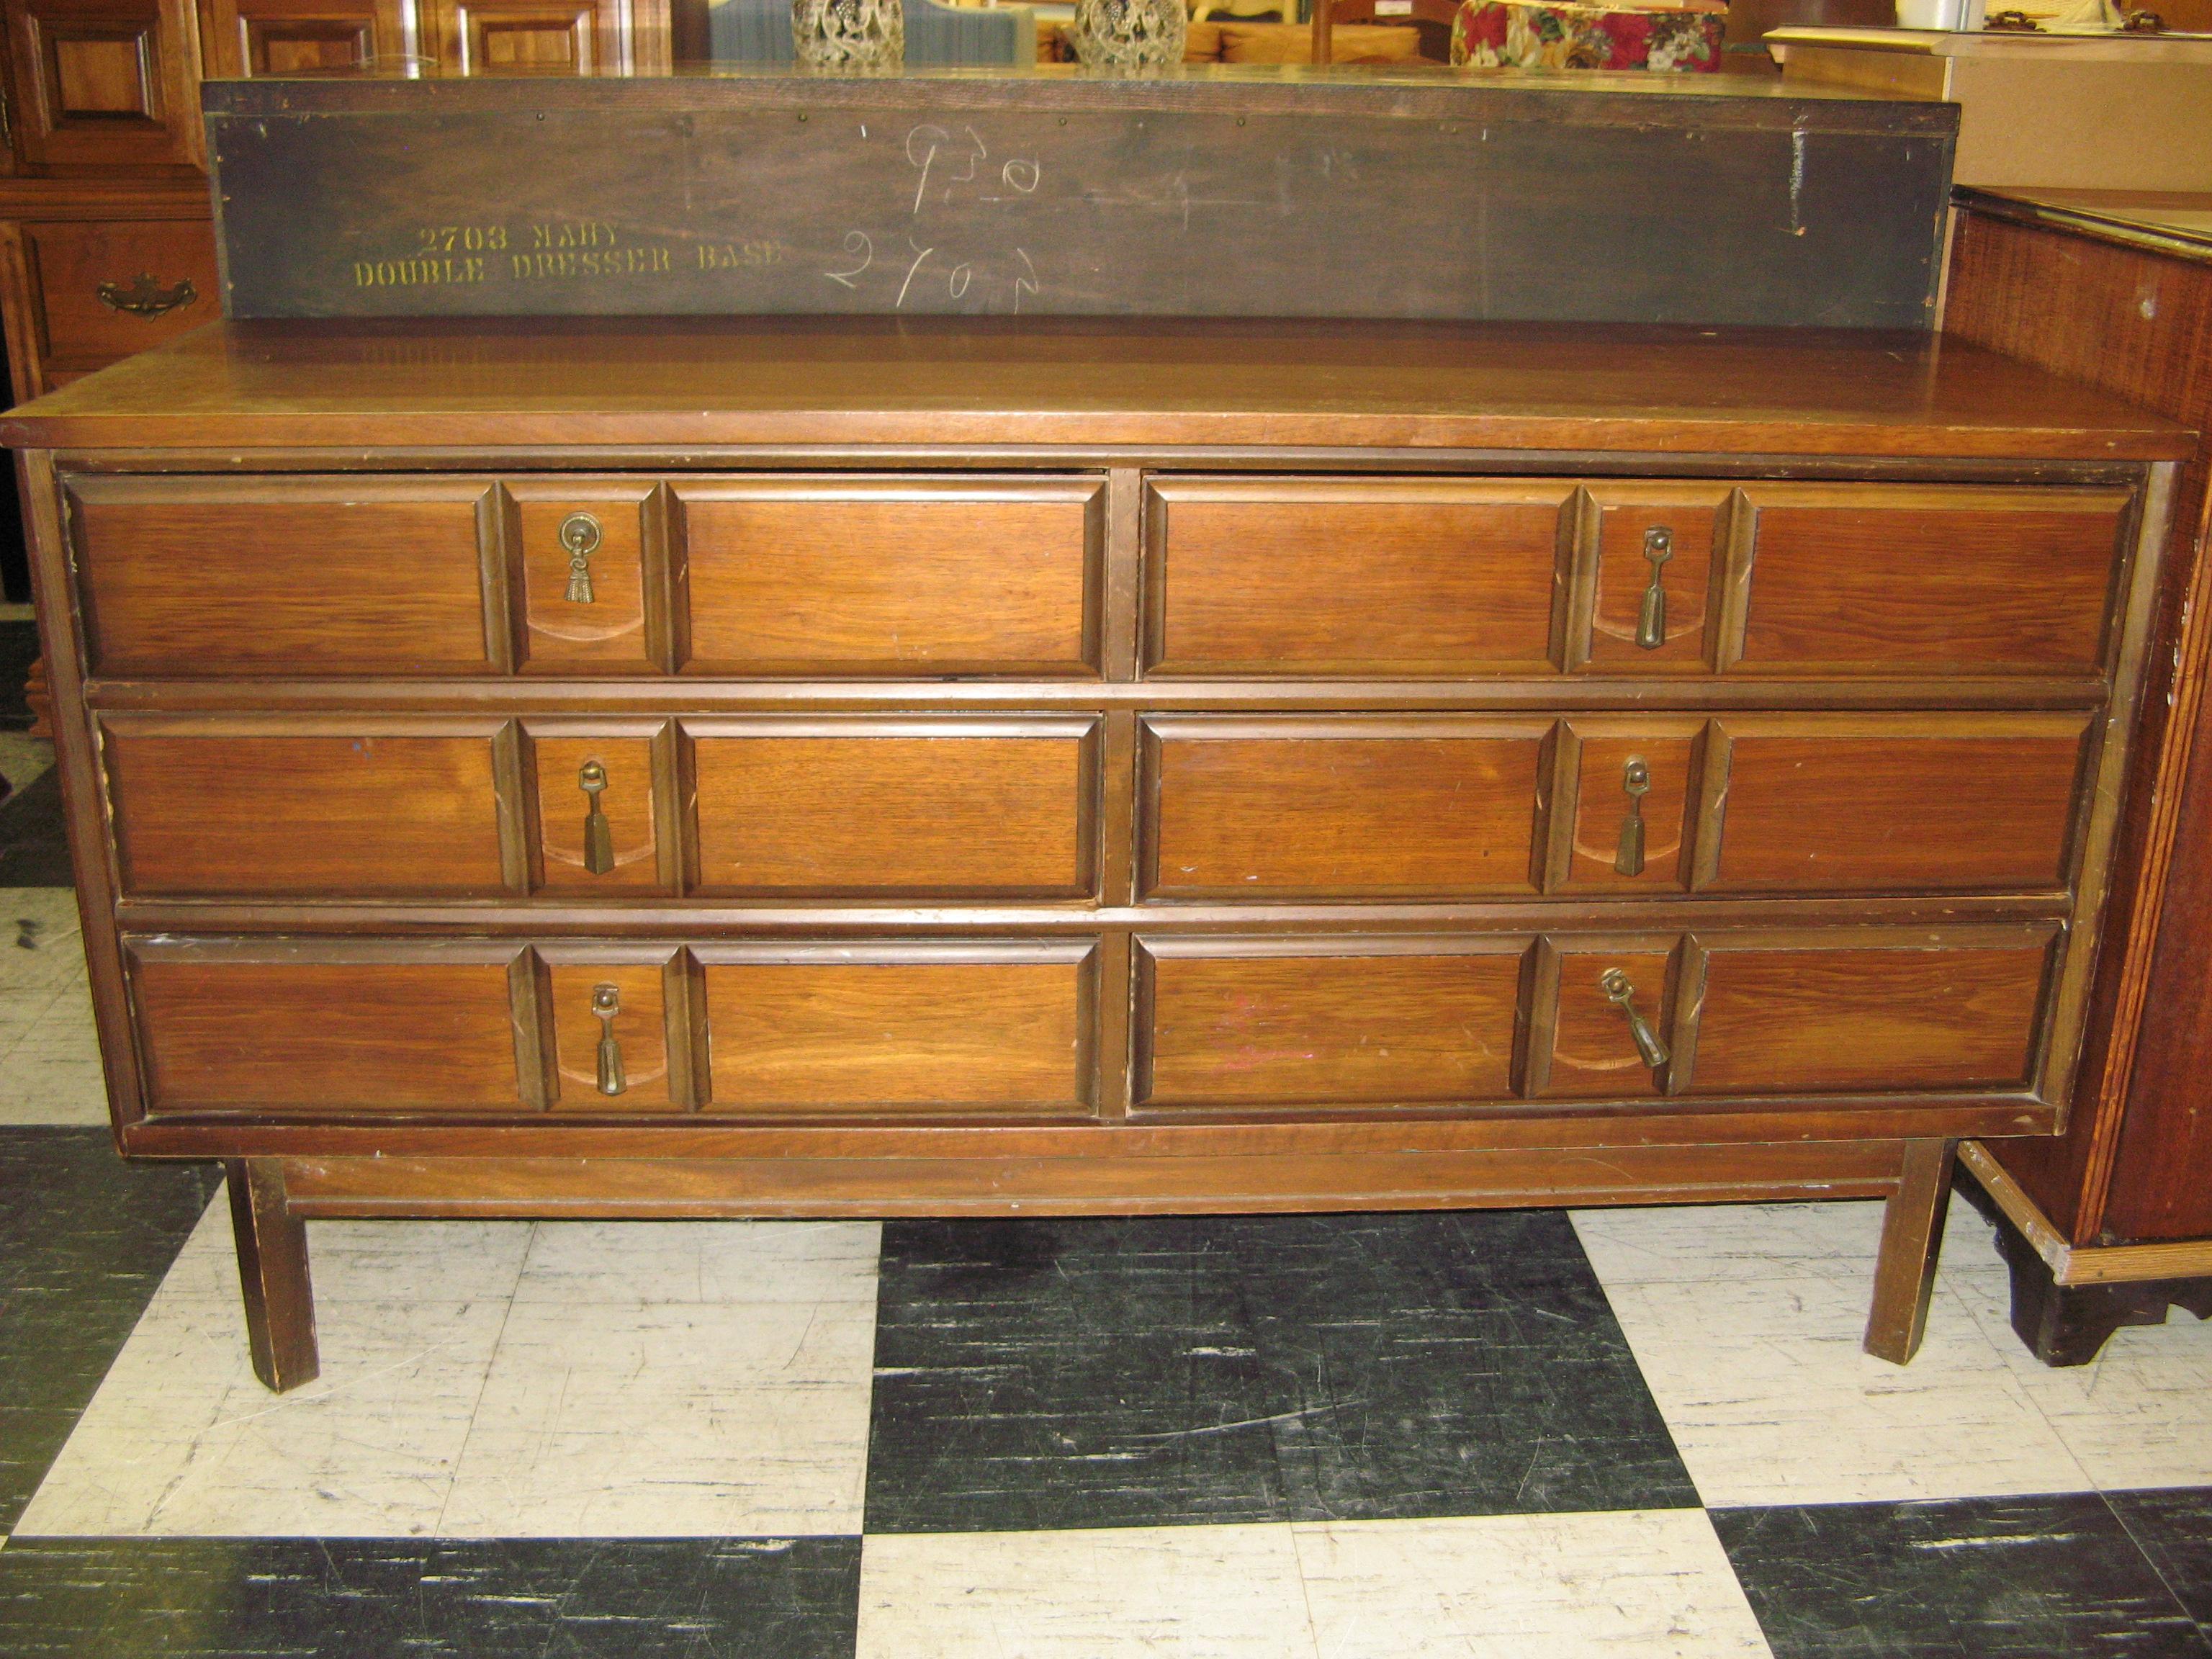 Bassett Double Dresser with Teardrop Drawer Pulls